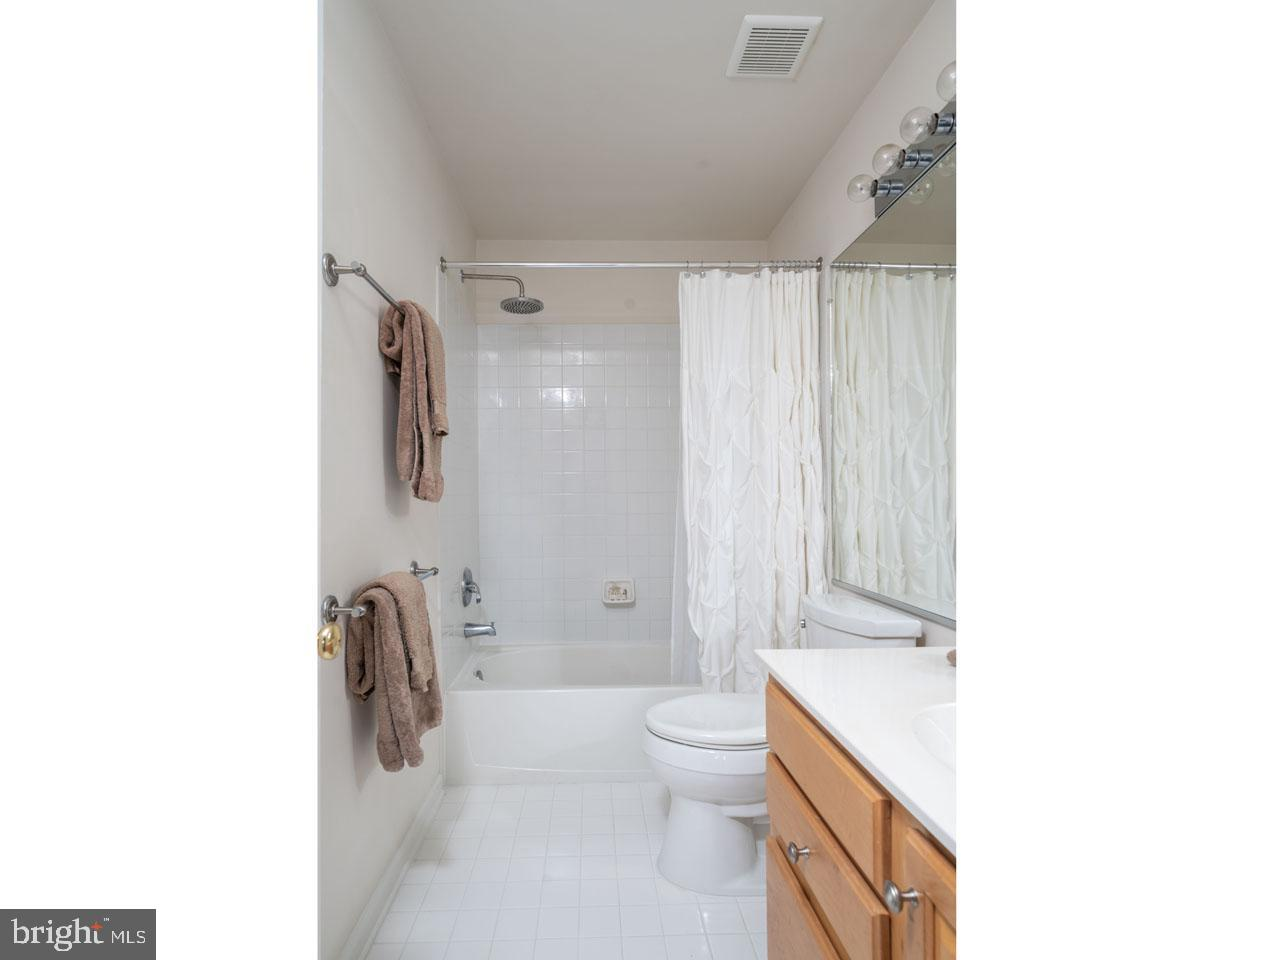 VAFX1104336-302201656529-2021-07-16-19-45-23  |   | Alexandria Delaware Real Estate For Sale | MLS# Vafx1104336  - Best of Northern Virginia